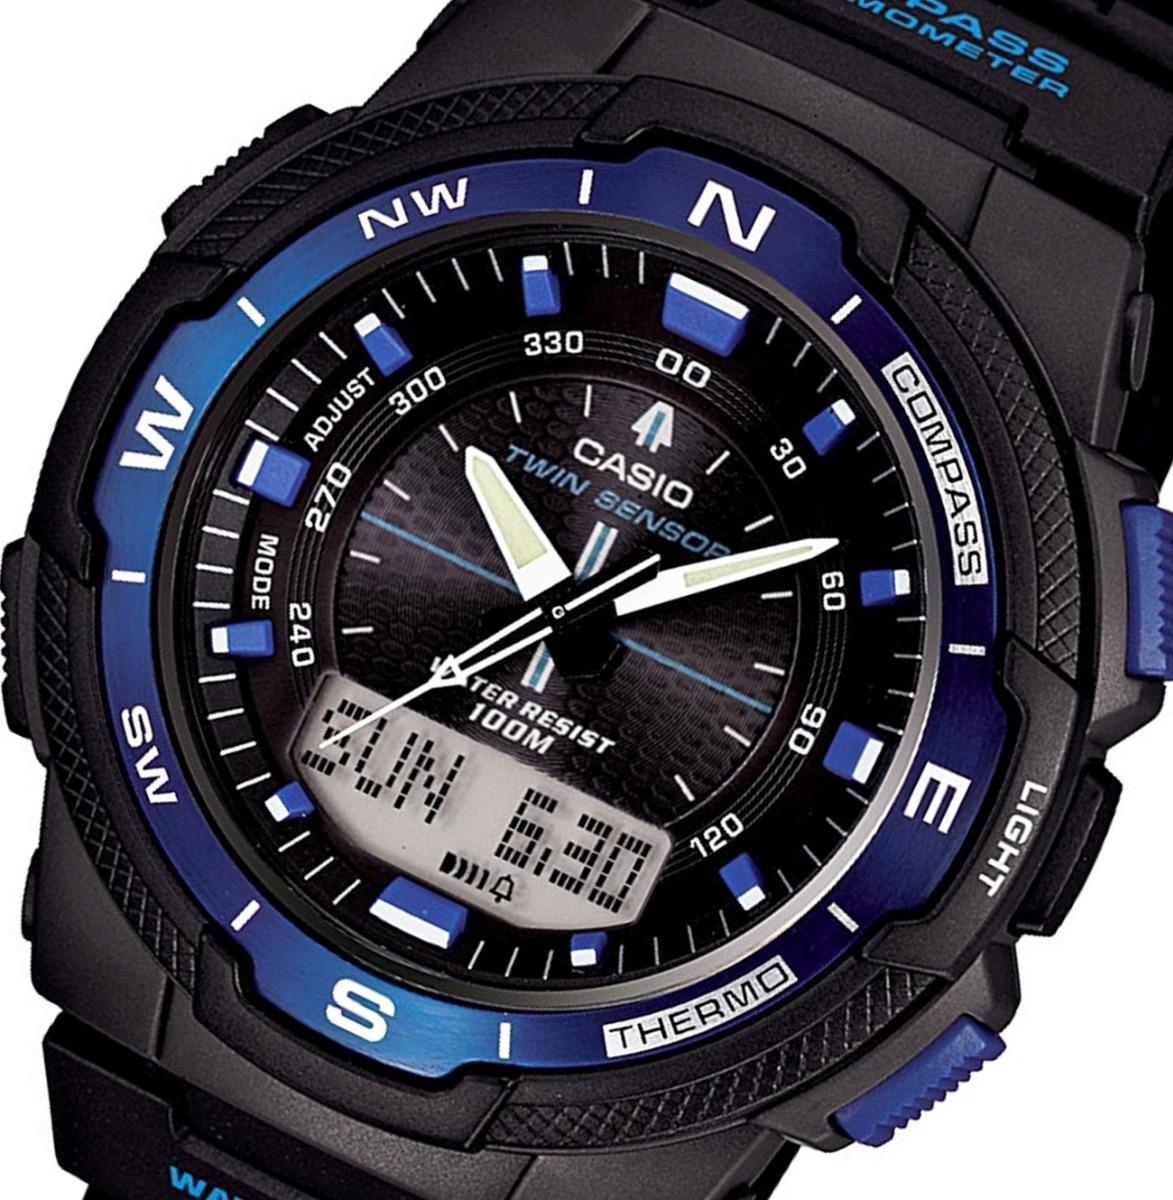 Hombre 2b Casio 500h Reloj CodSgw Brújula Termómetro rdtCshQ